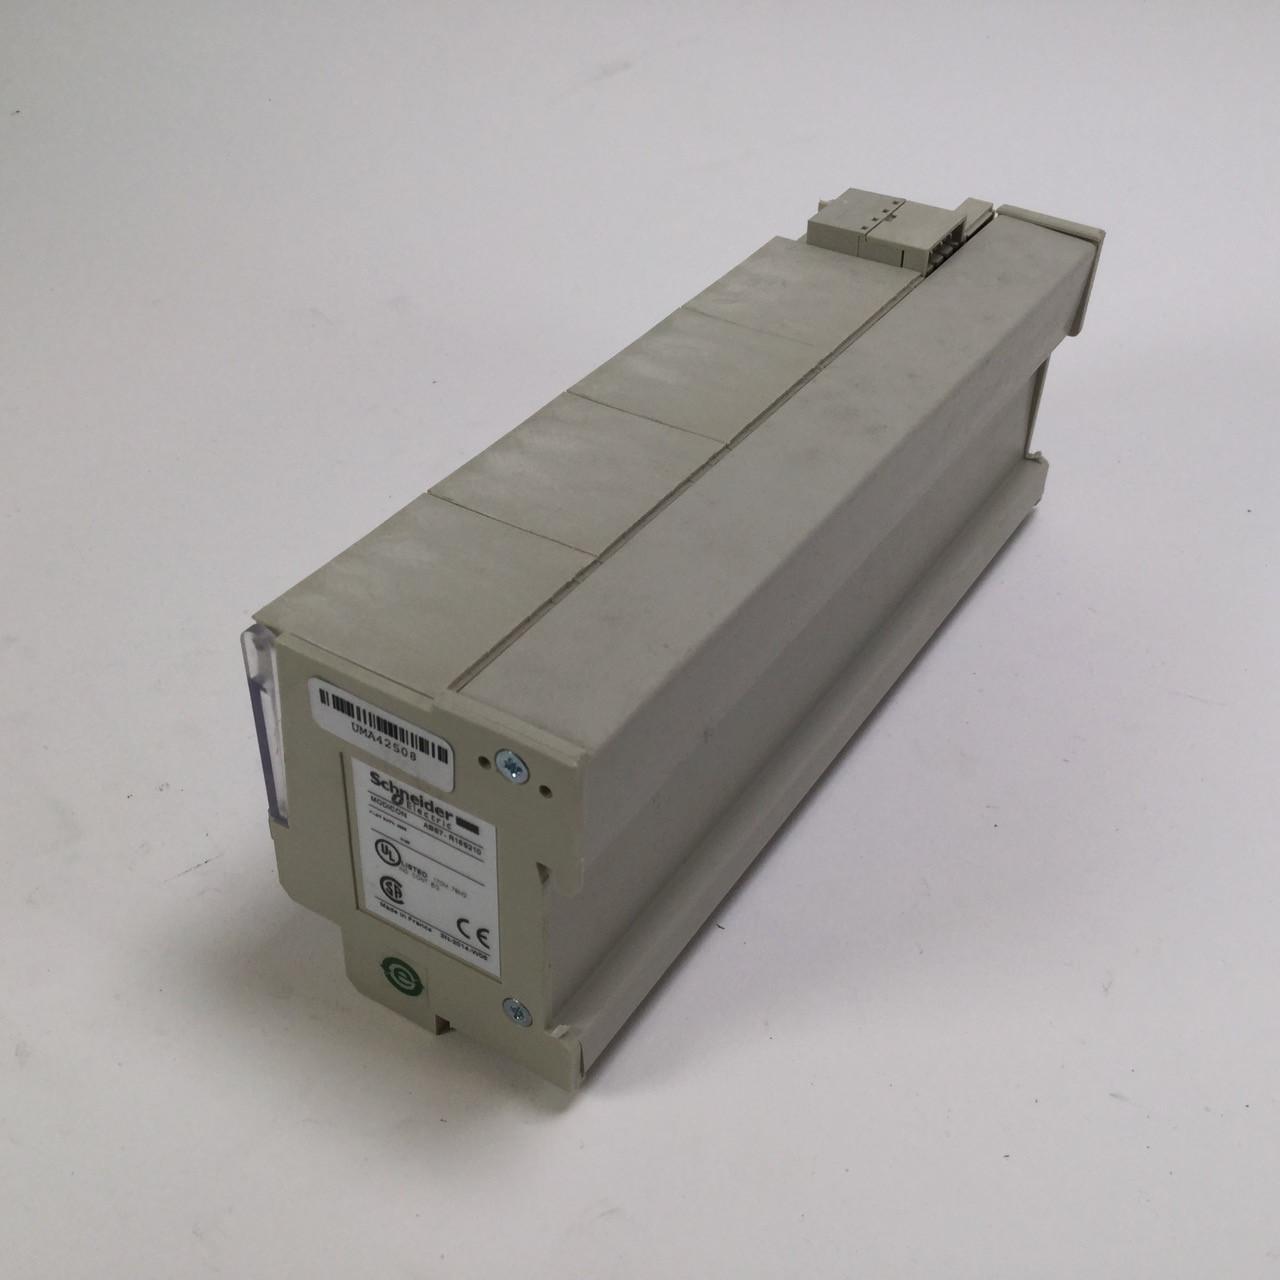 Schneider Electric ABE7-R16S210 sub-base relay relais Used UMP